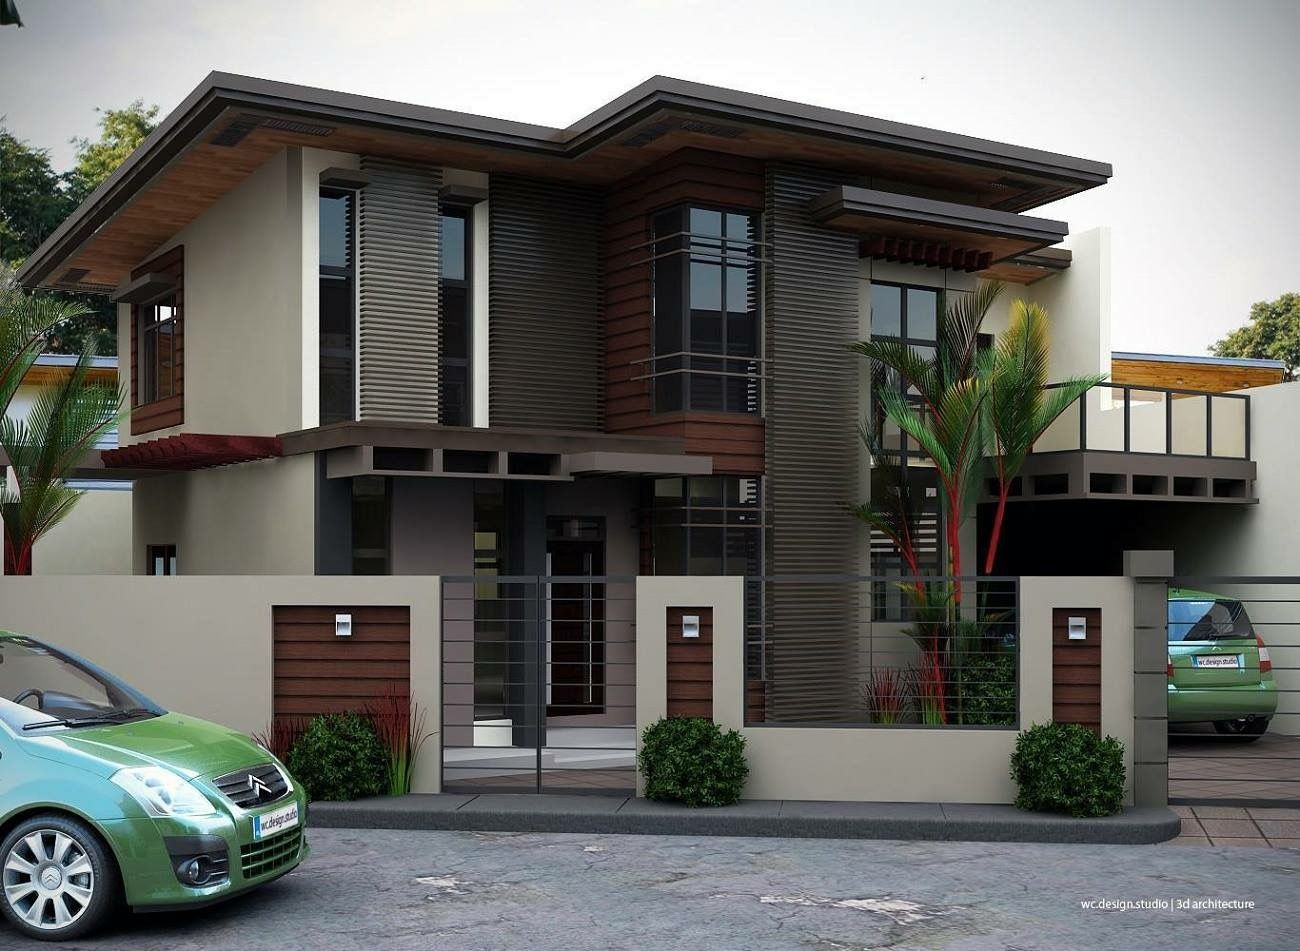 storey house design double plans modern zen also best images in home decor future rh pinterest